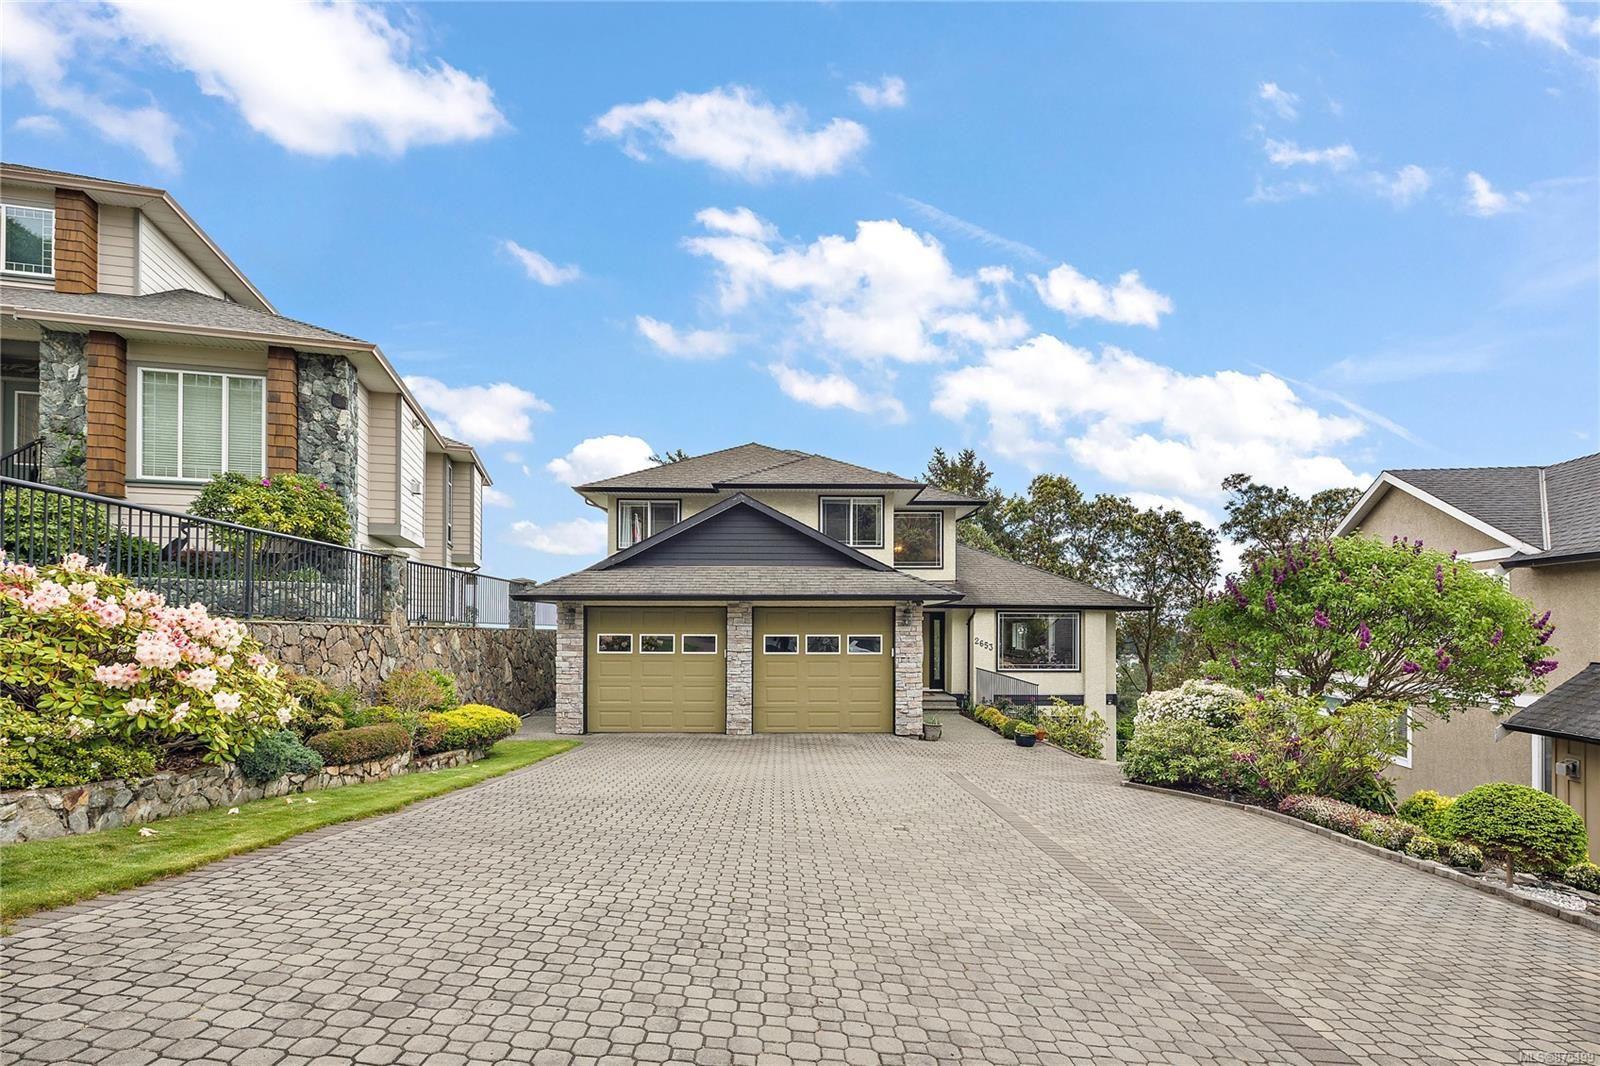 Main Photo: 2653 Platinum Pl in : La Atkins House for sale (Langford)  : MLS®# 875499